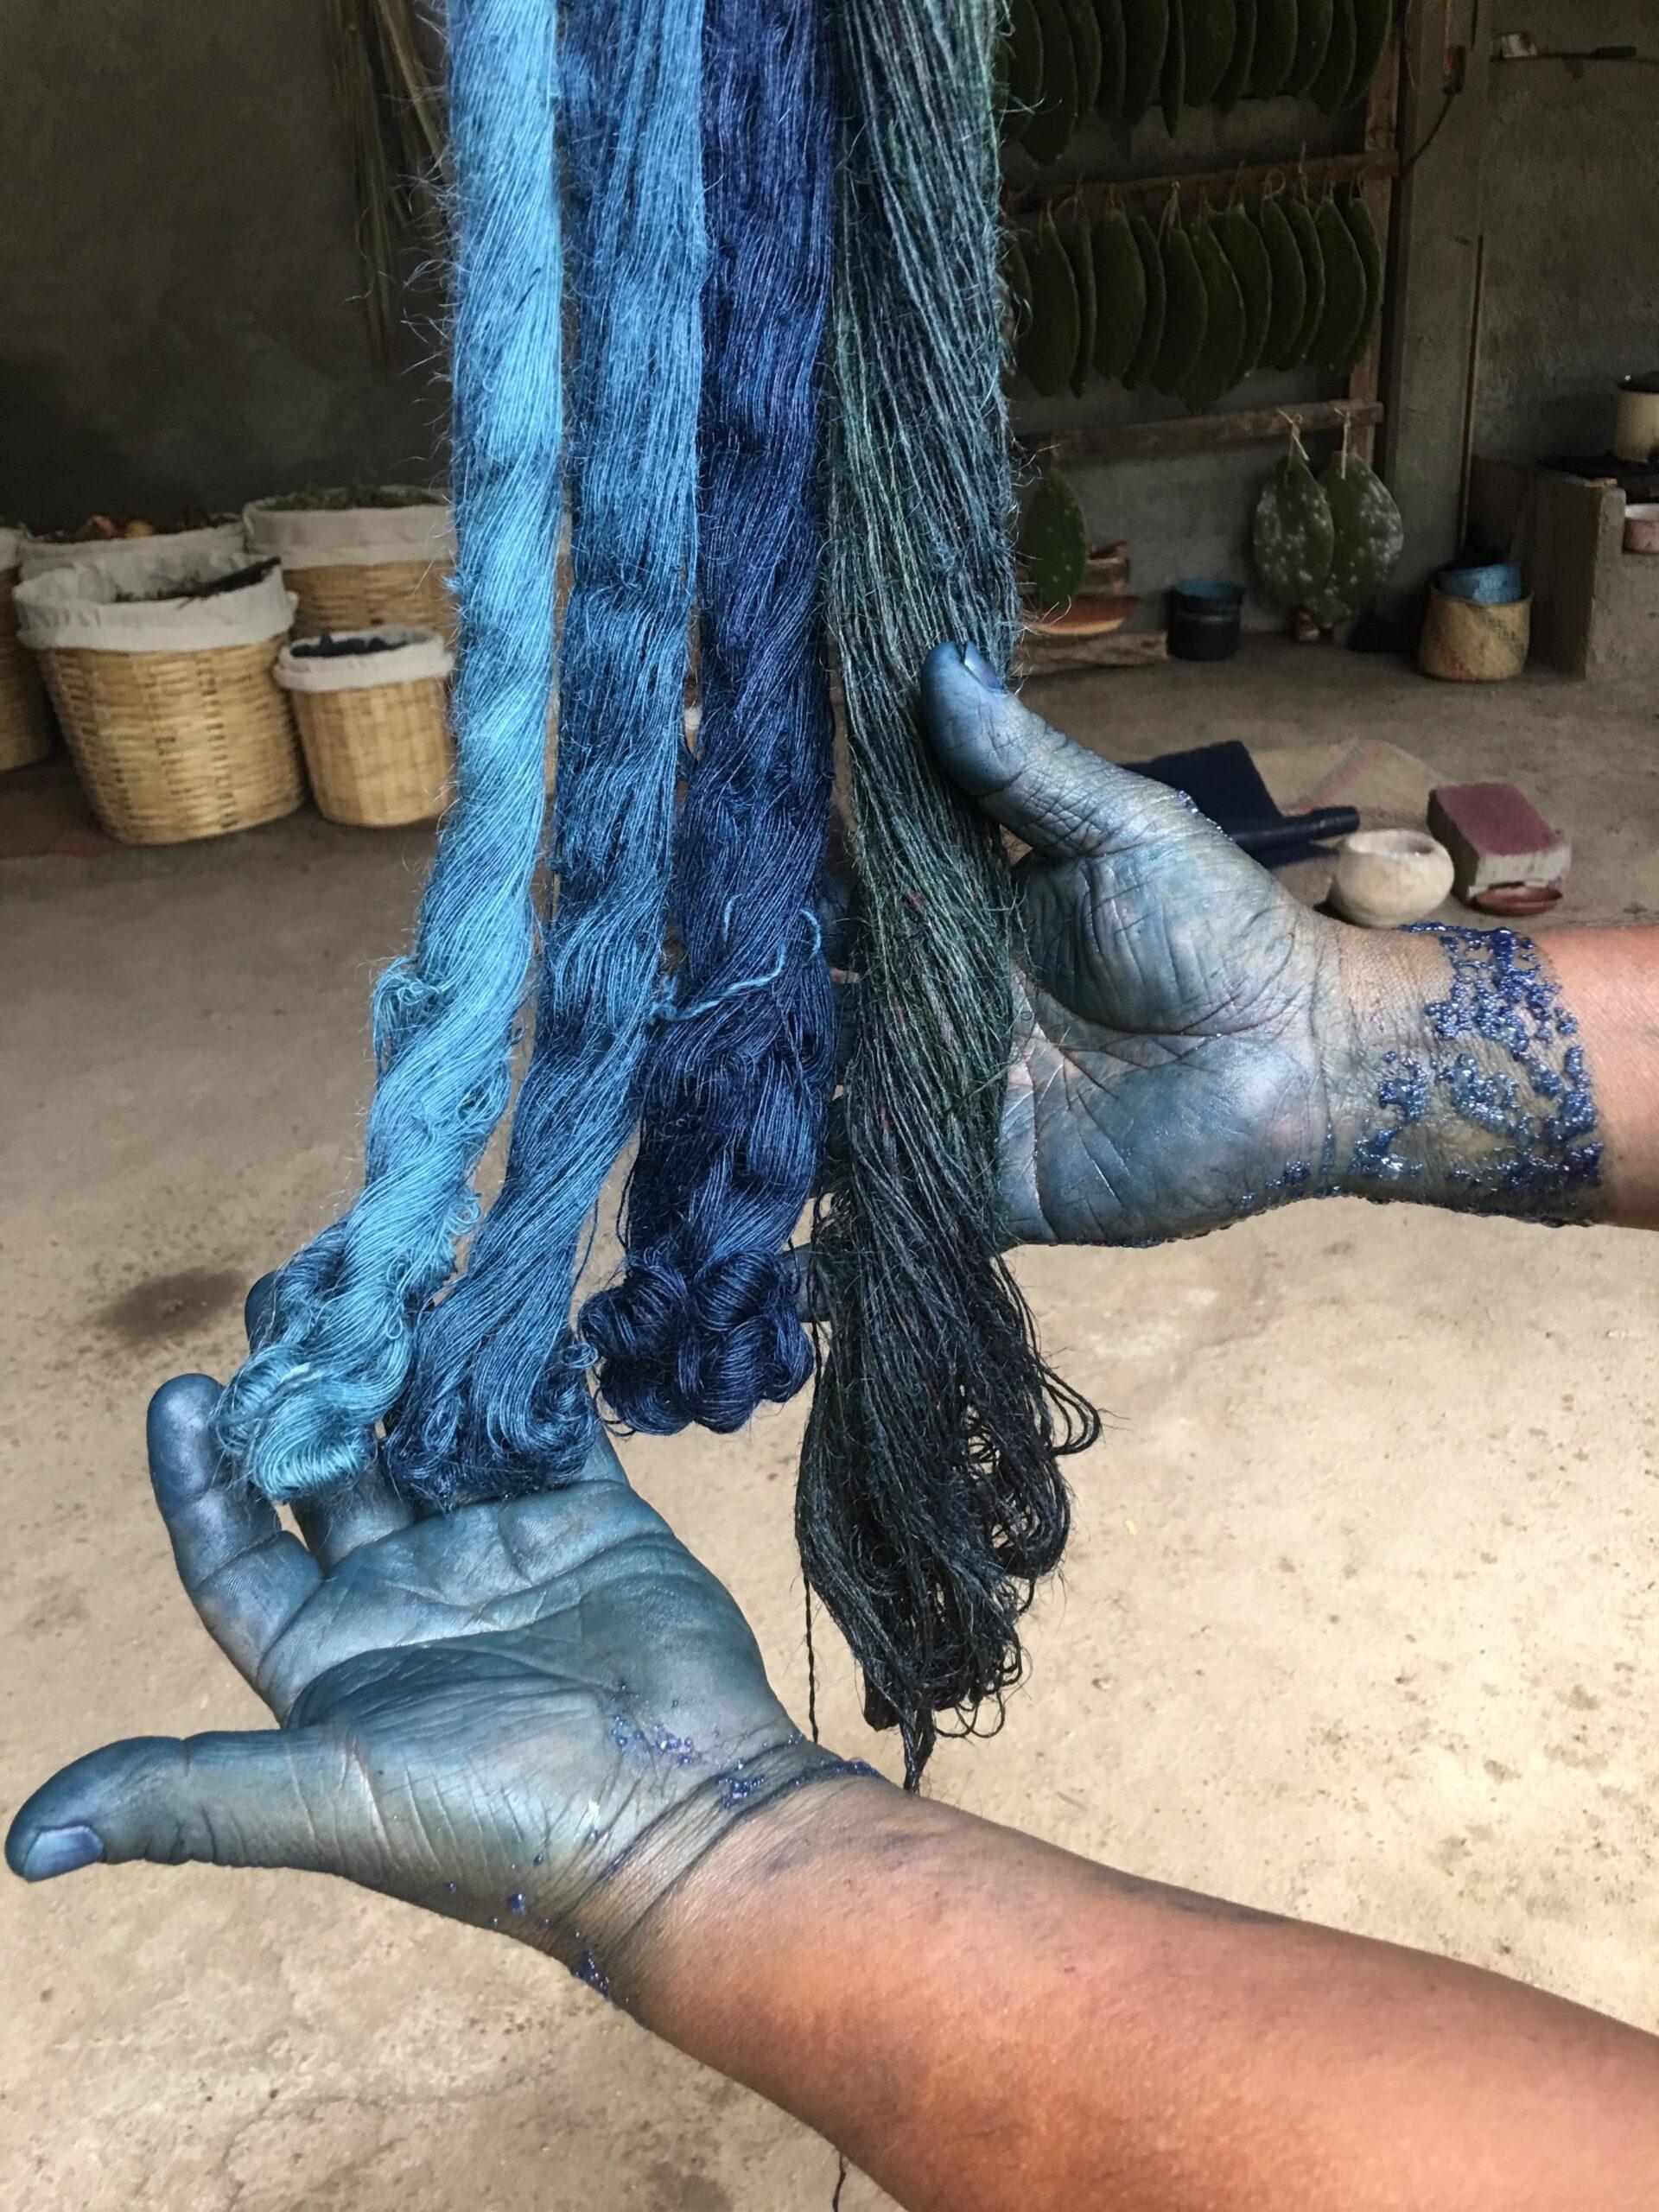 indigo-dyed yarns in the studio of Porfirio Gutiérrez y Familia